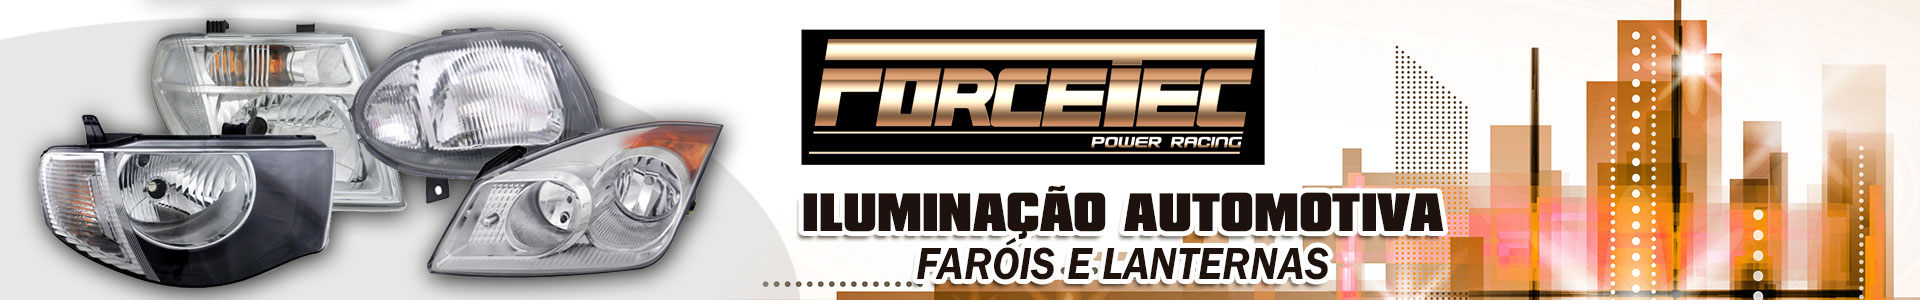 iluminacao-automotiva-forcetec-ips-brasil